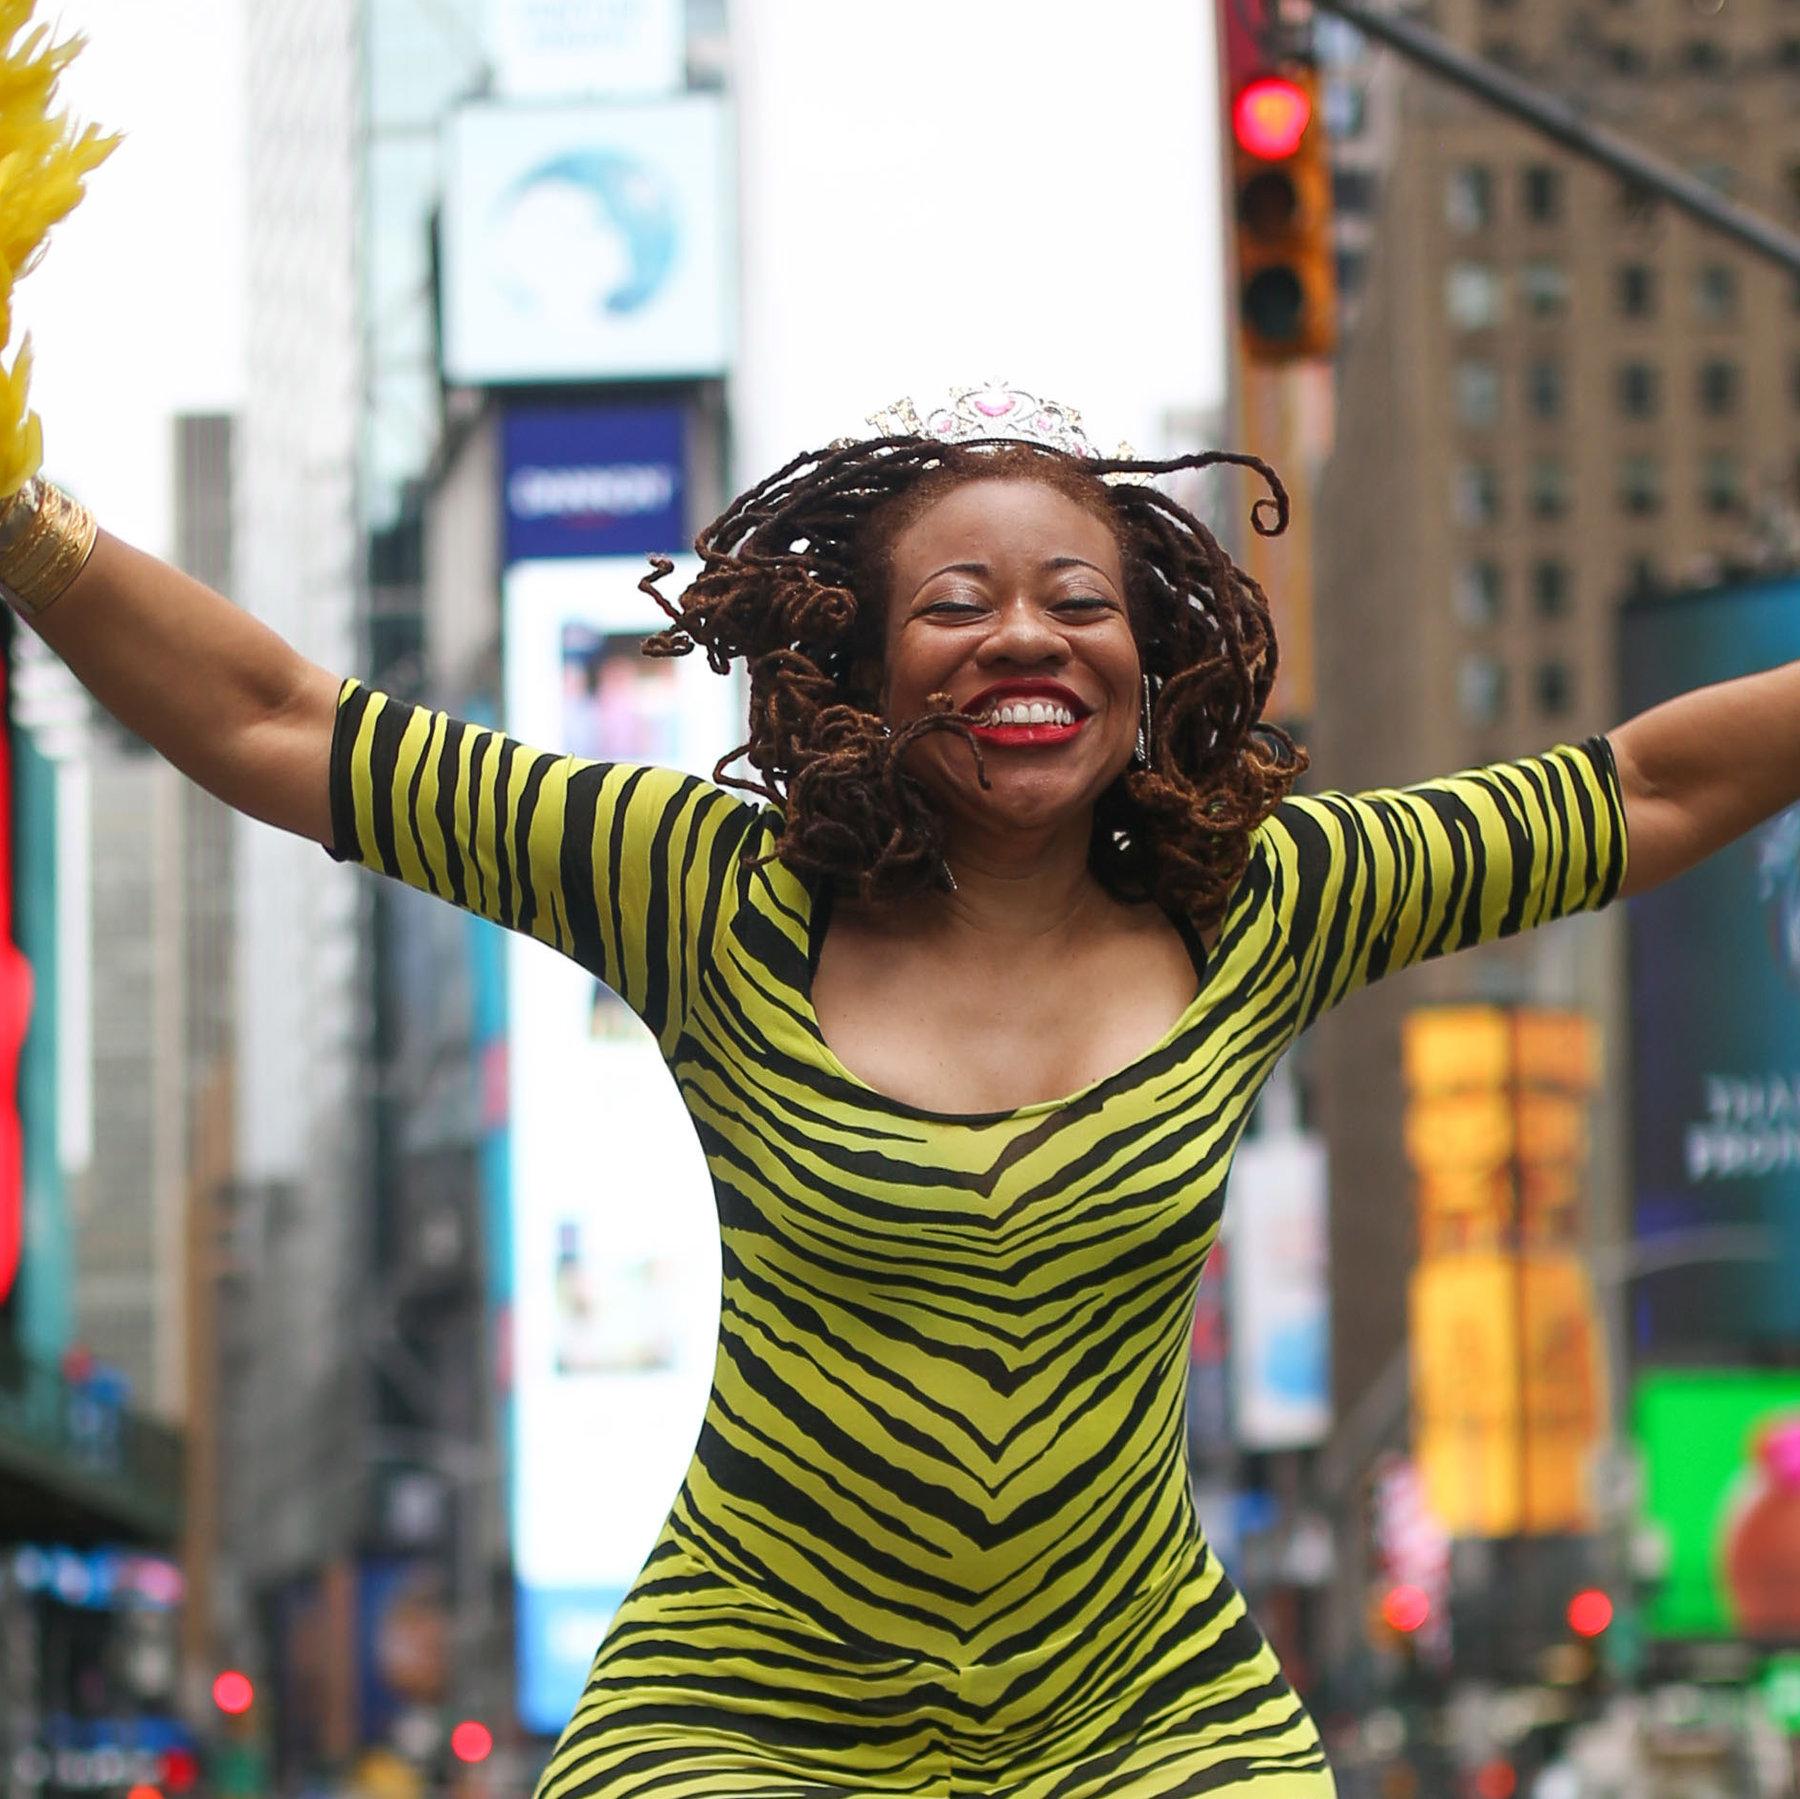 New York-Based Ayana Evans Reveals Her Honest Experience